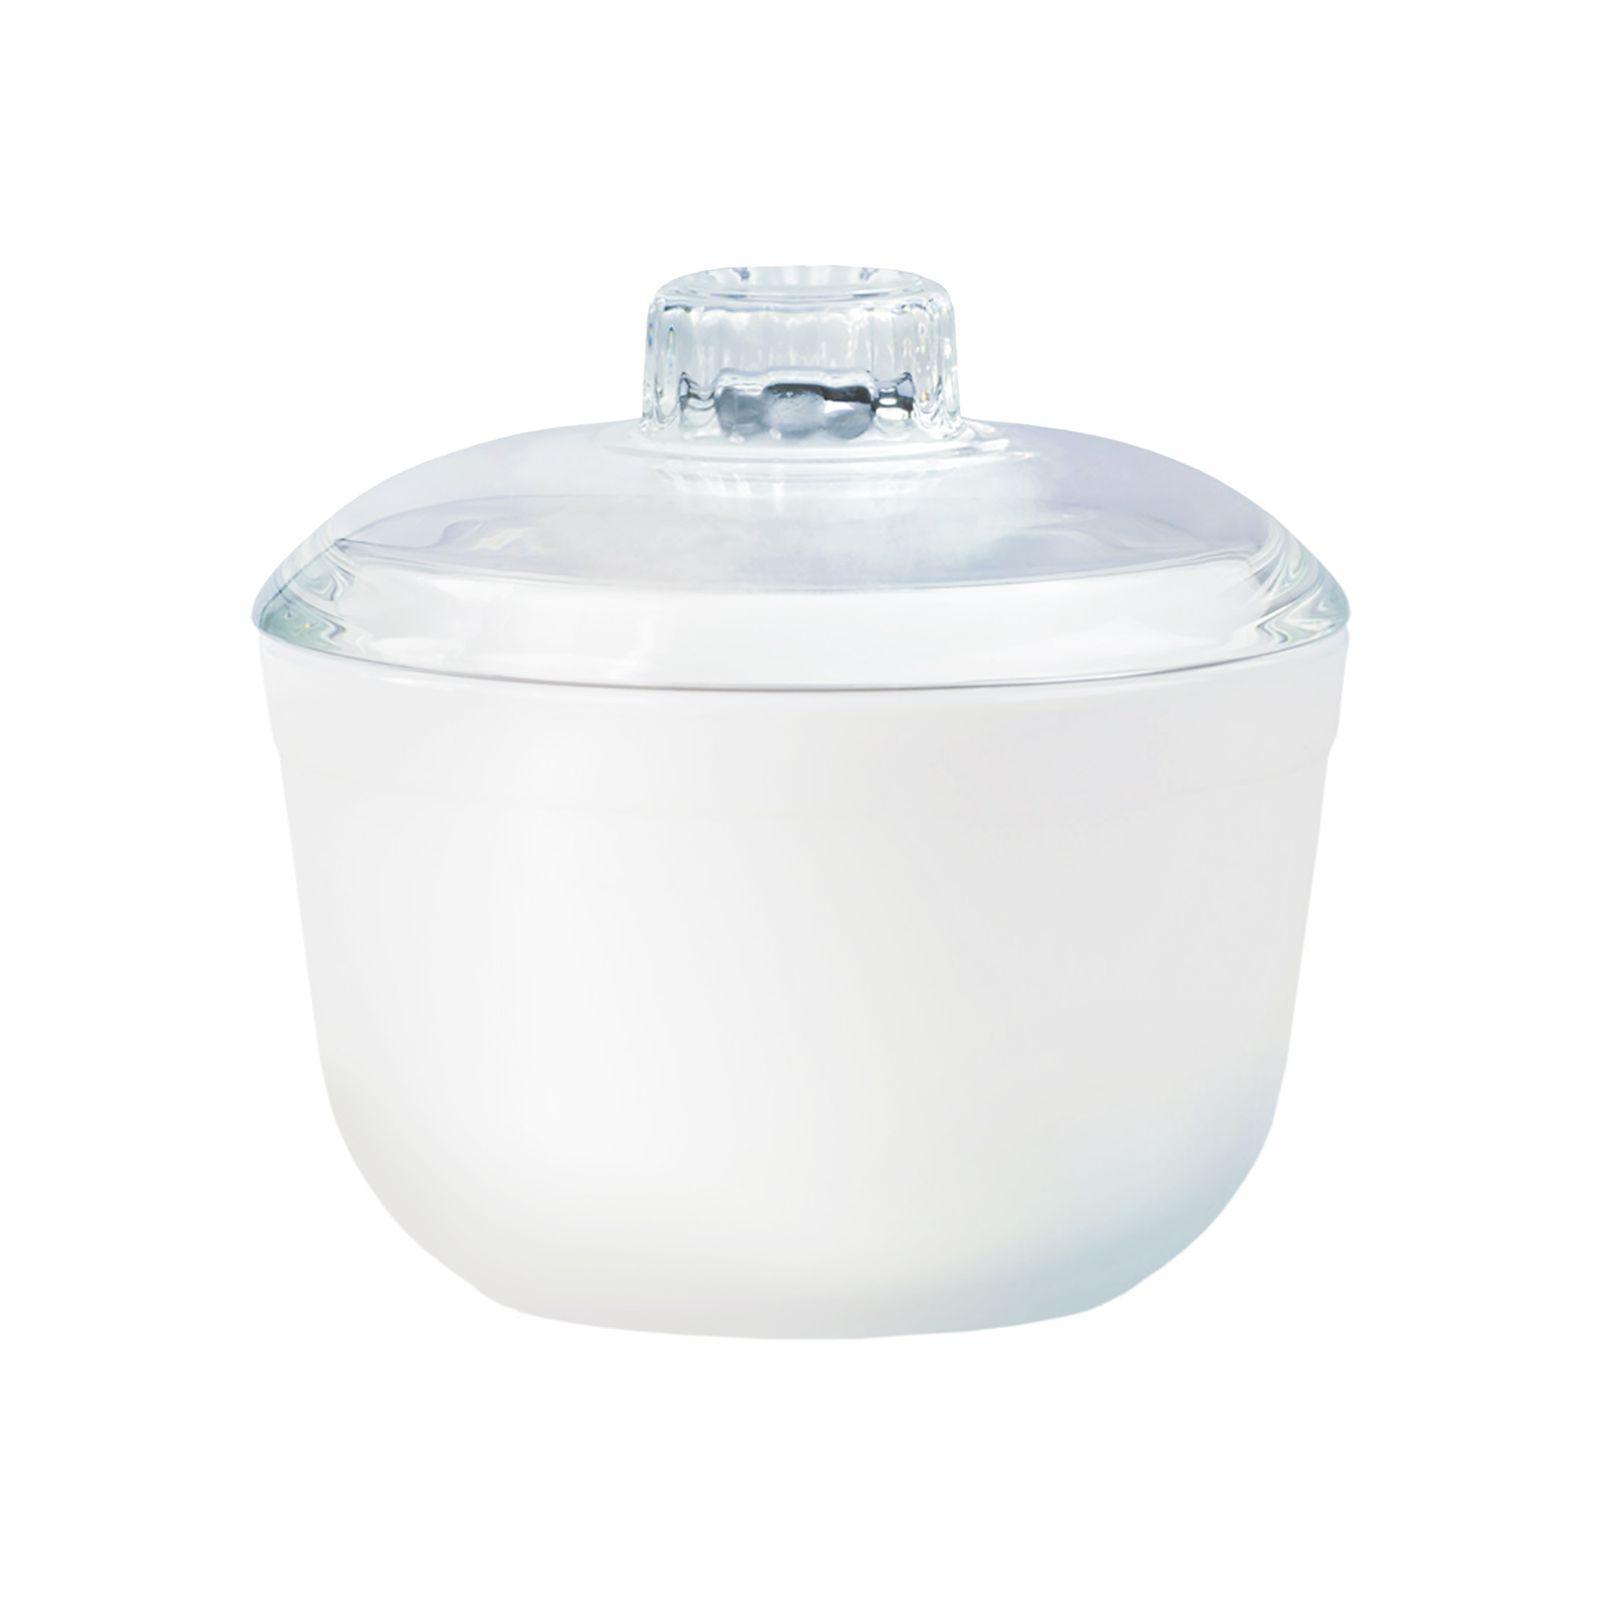 Sugar bowl Essence 11 cm LUMINARC